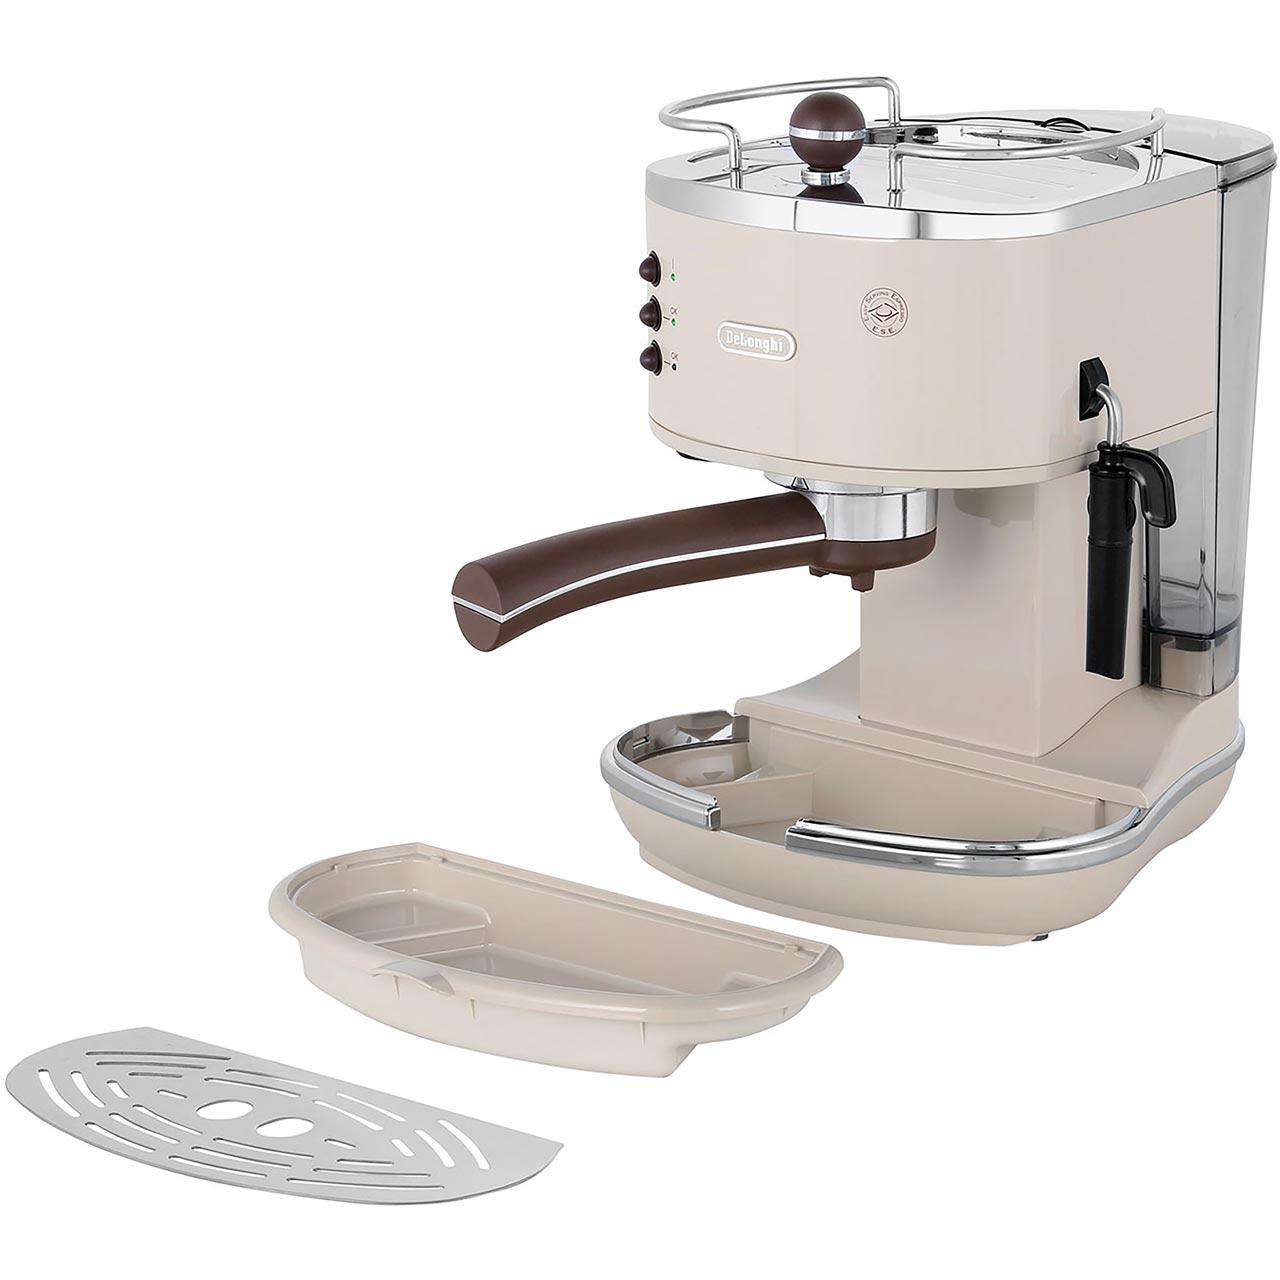 DeLonghi ECOV311.BG Icona Vintage Traditional Pump Espresso Coffee Machine 15 2